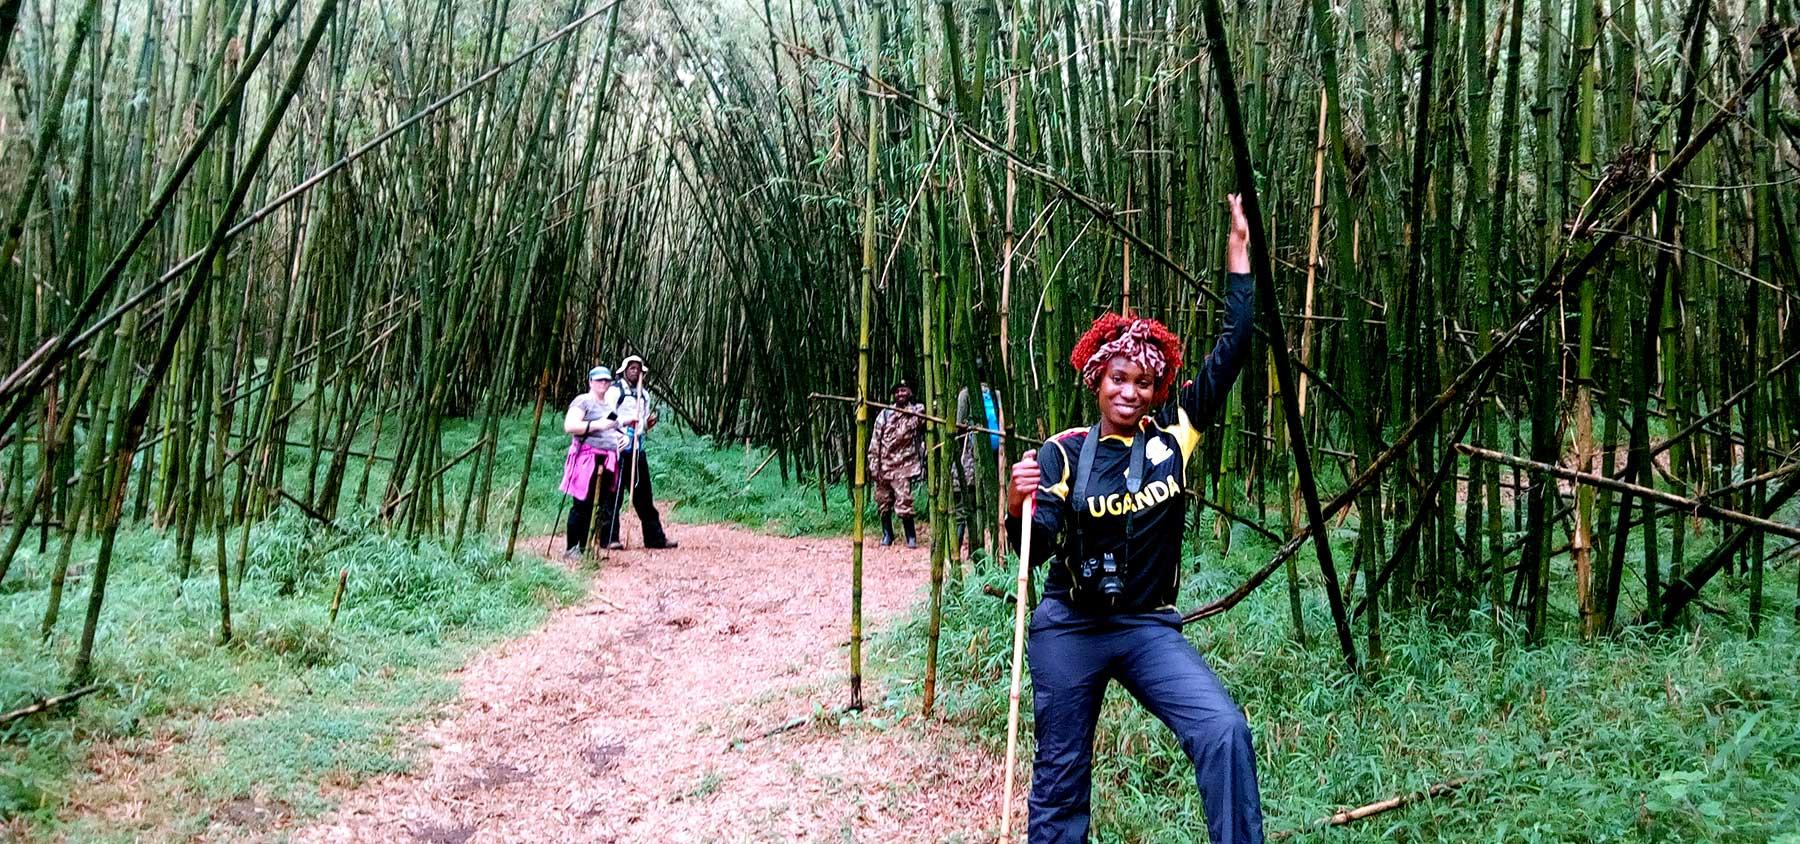 Lorna Paska on the trail up Mt. Mgahinga in Uganda. Take you hike safari with Kwezi Outdoors